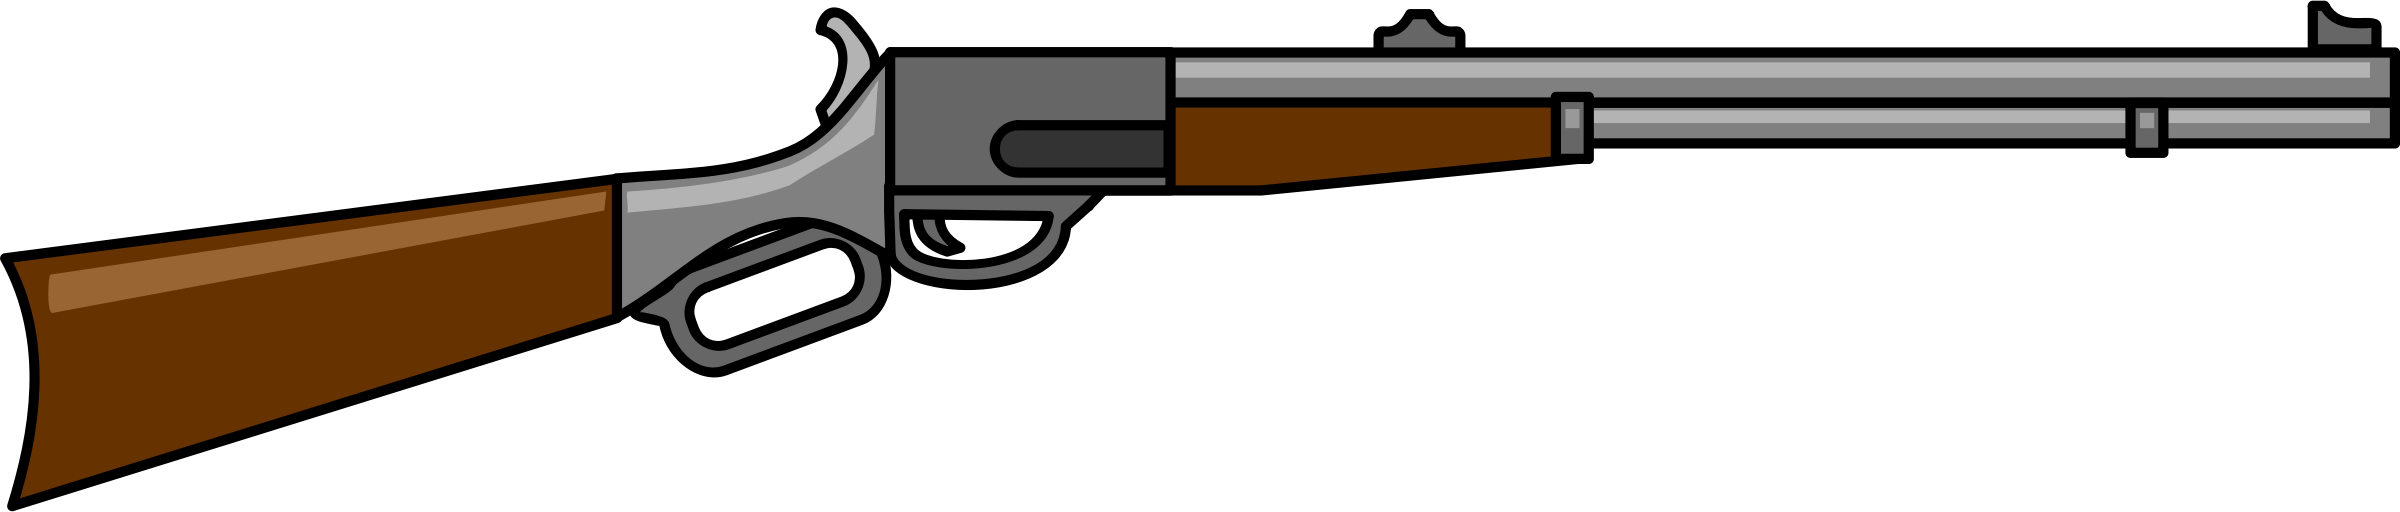 This free Icons Png design of Gun 11 PlusPng.com  - Cartoon Gun PNG